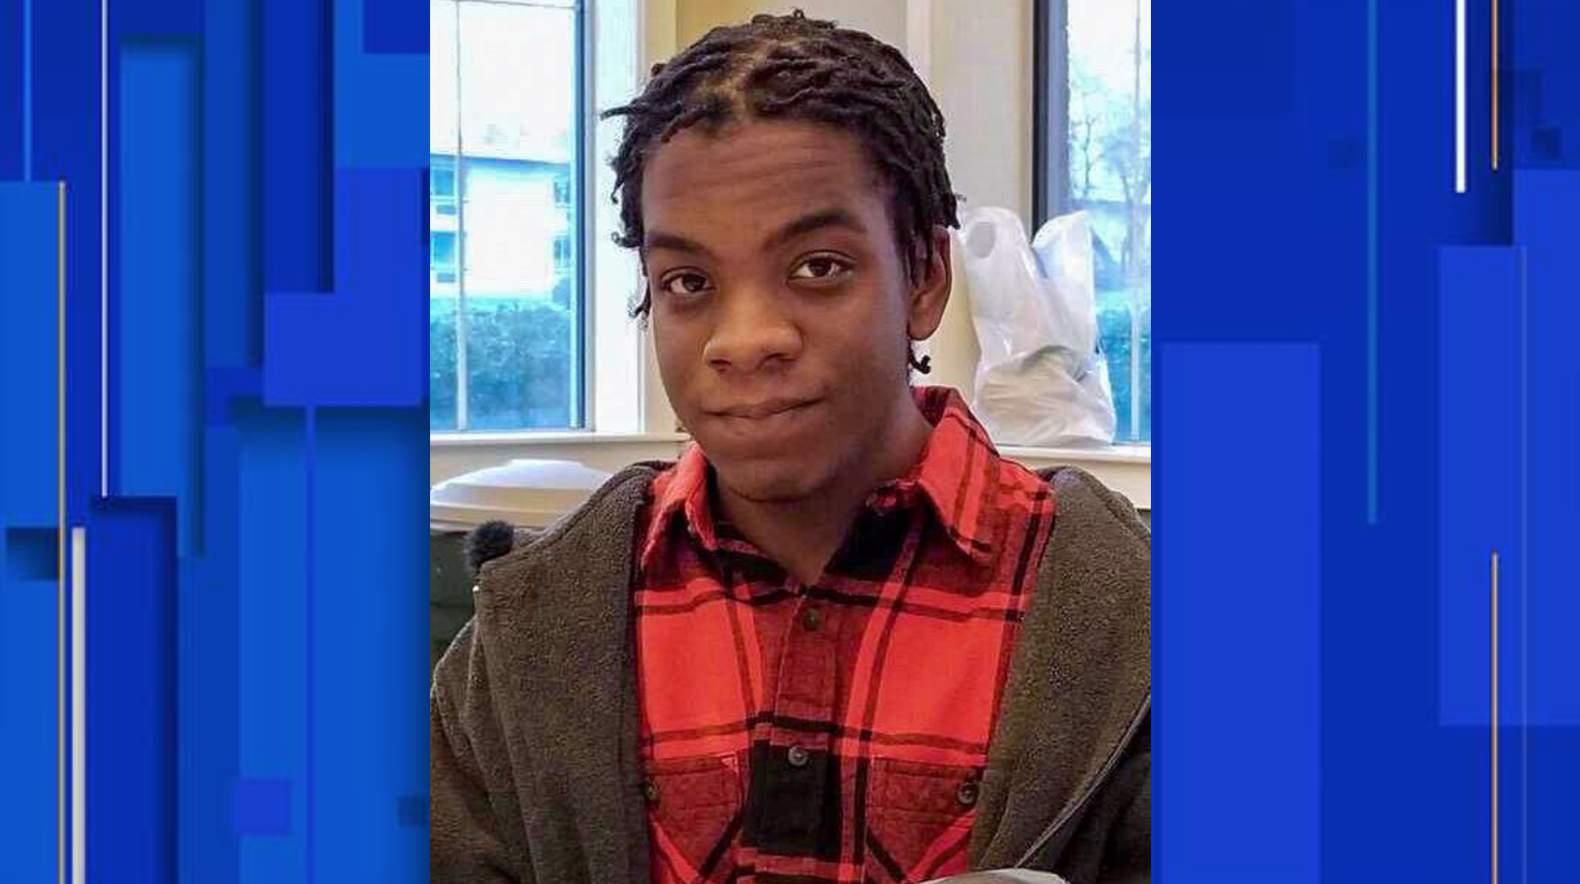 Teen critically injured in jump